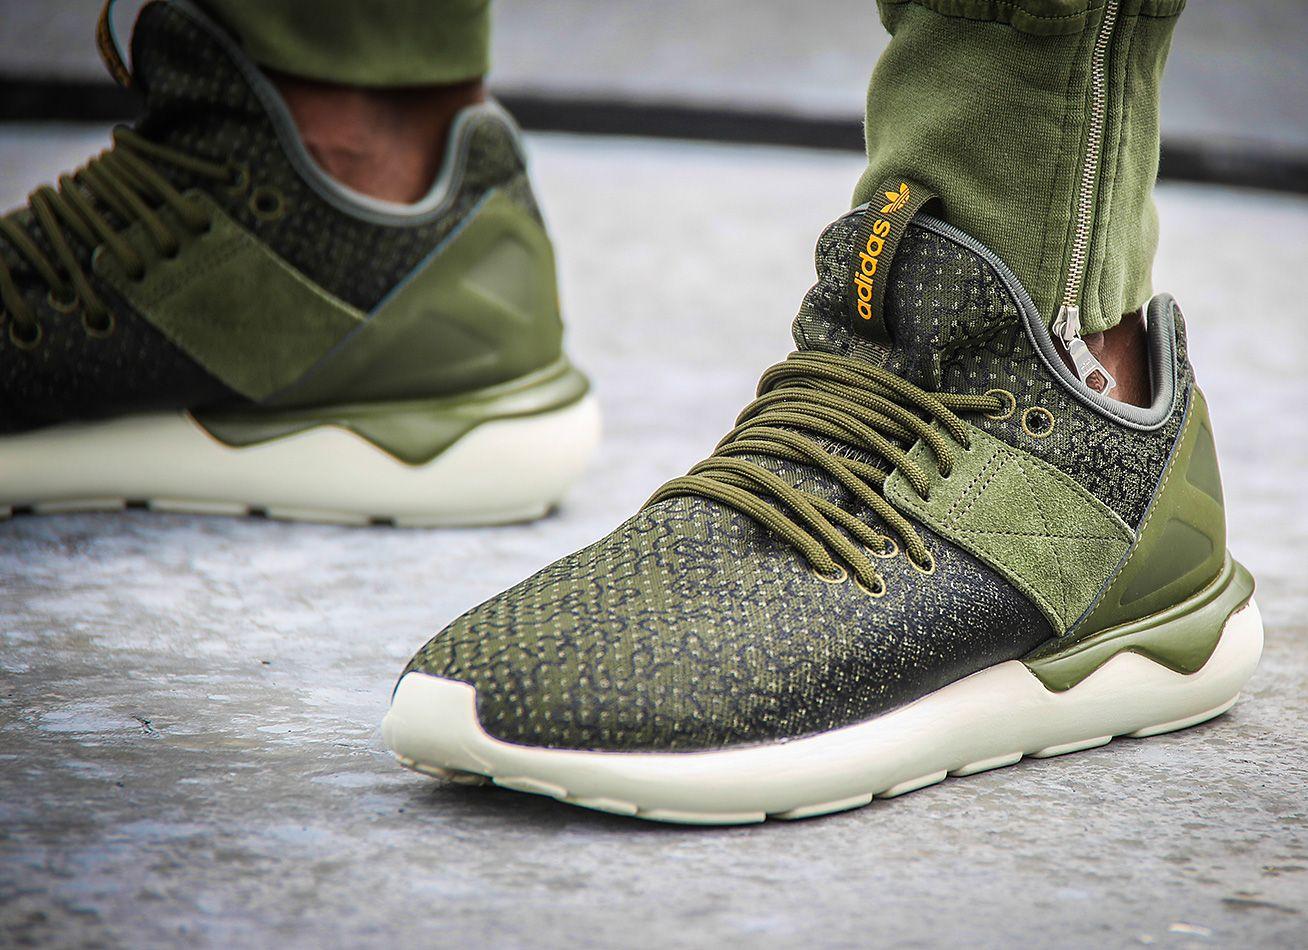 adidas shoes navy tubulars olive green 640104